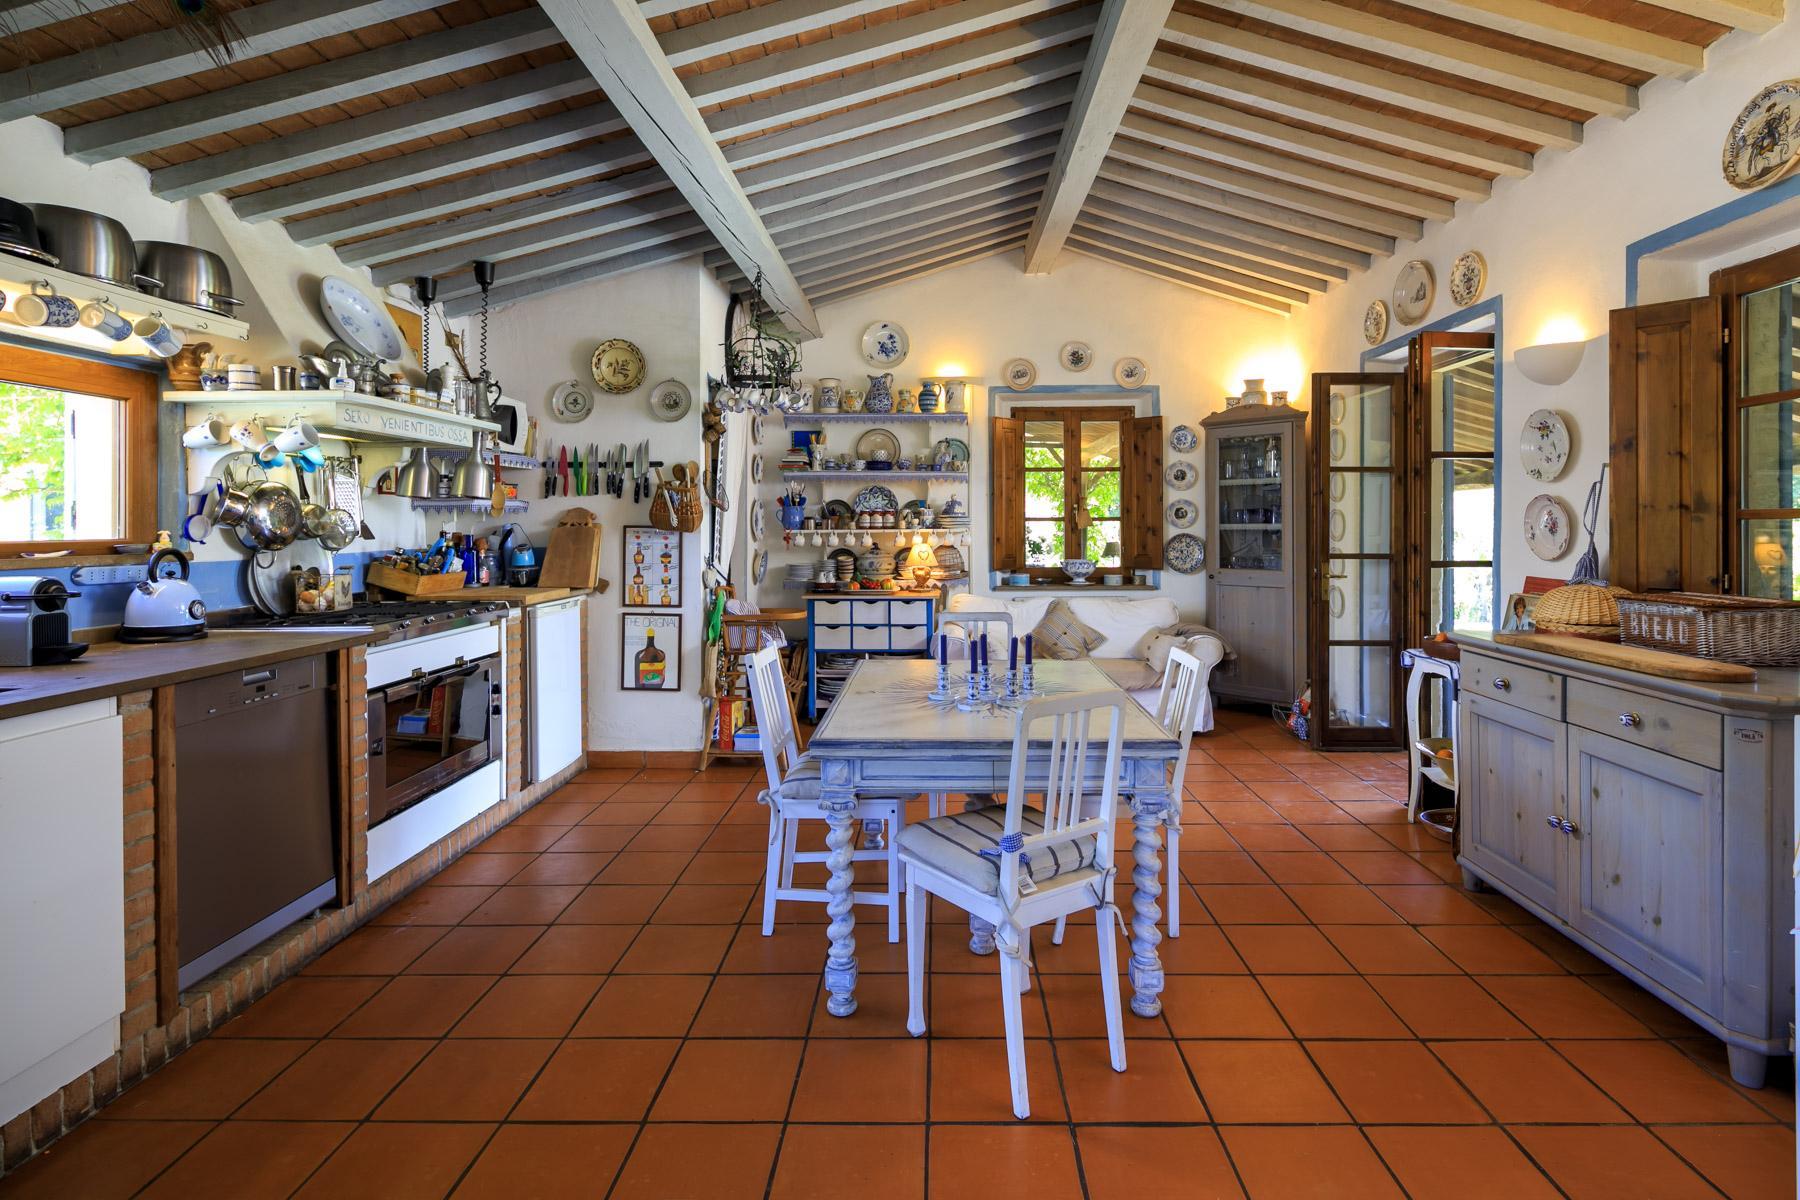 Belle villa toscane avec piscine - 14